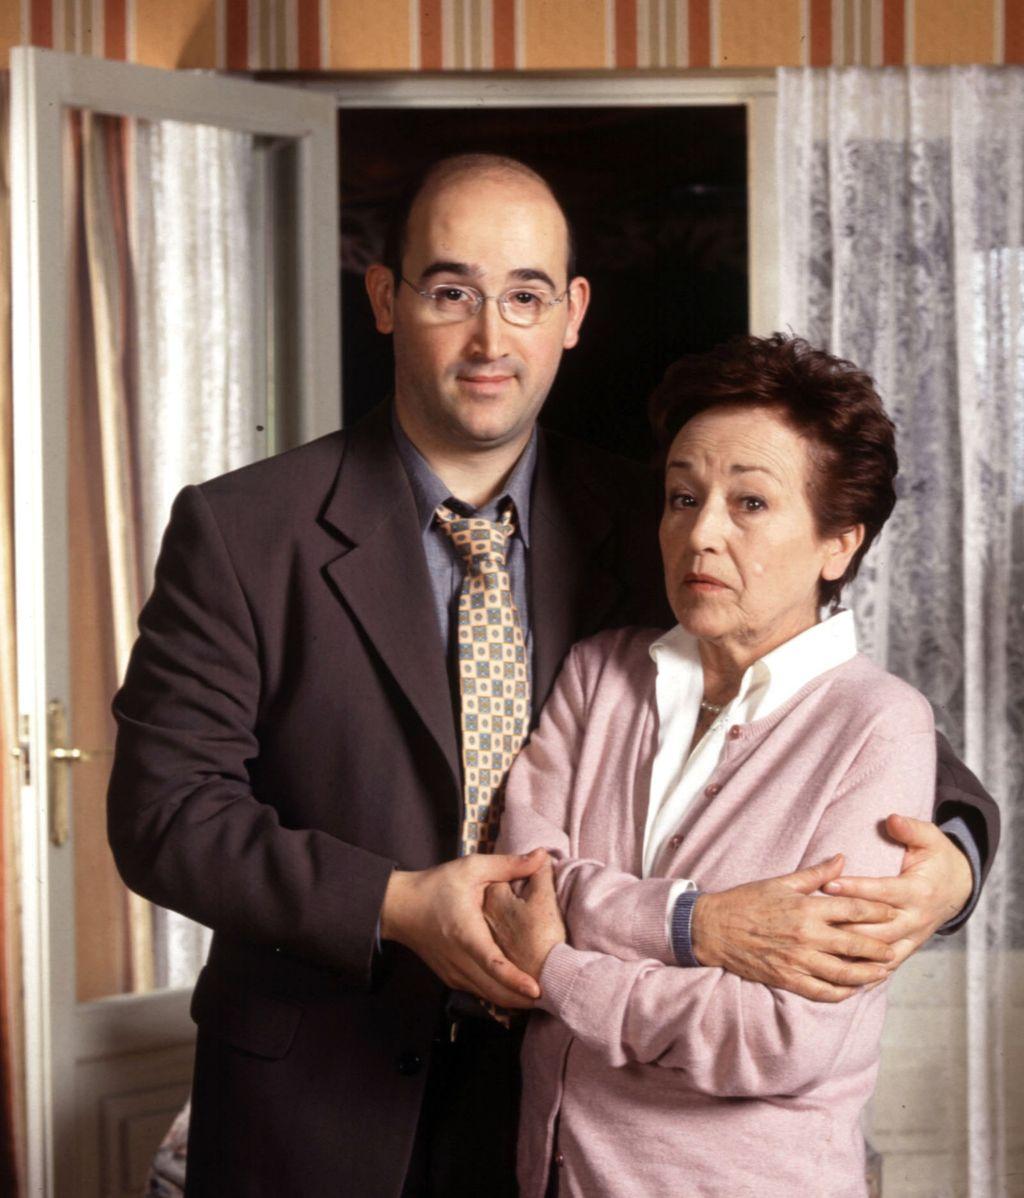 '7 vidas', comedia icónica en España, descubrió a grandes talentos del panorama nacional.